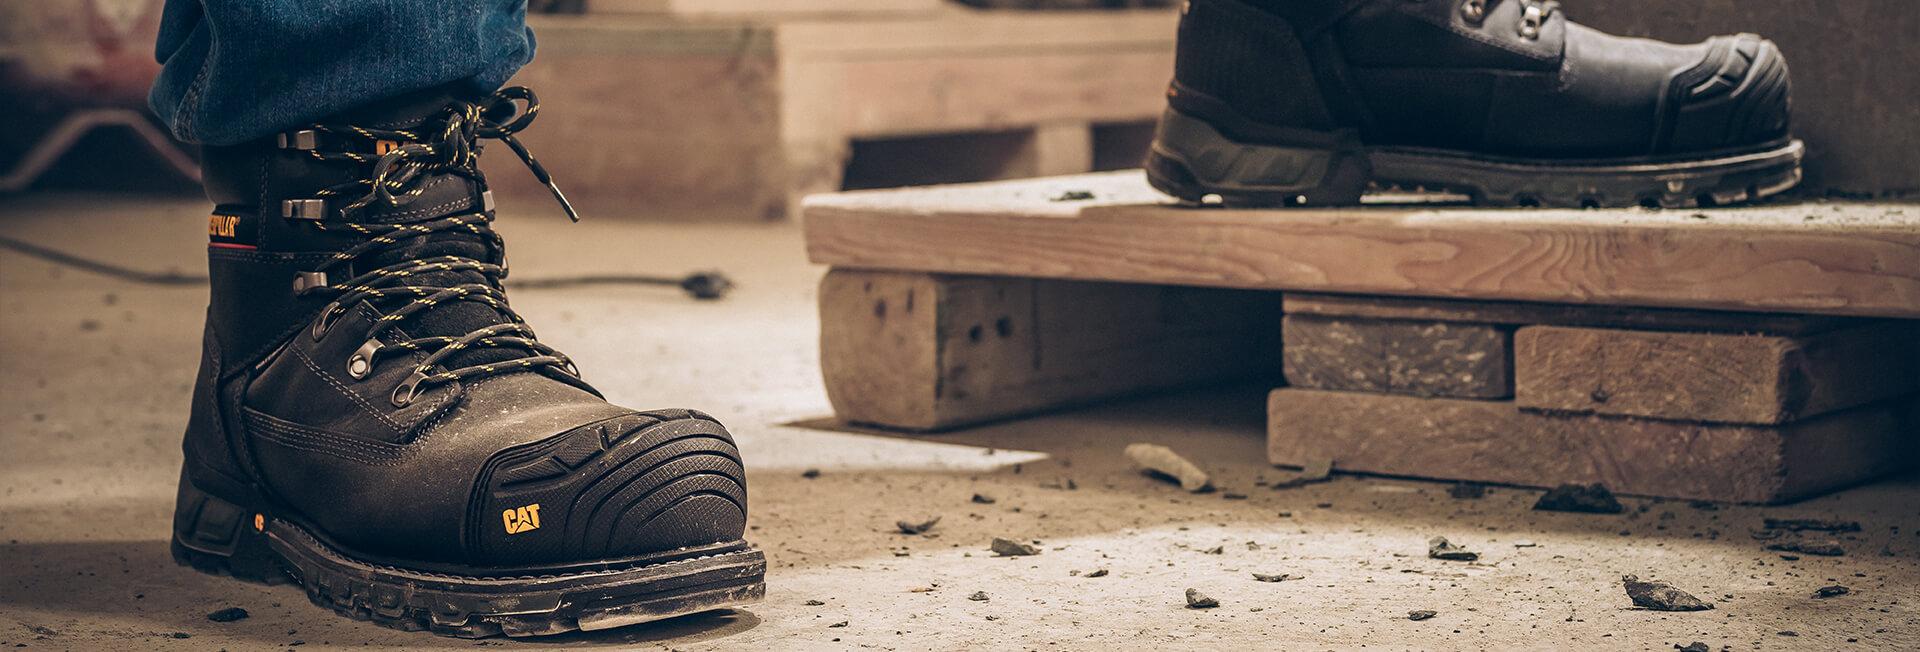 Feet in boots, stood on bricks.